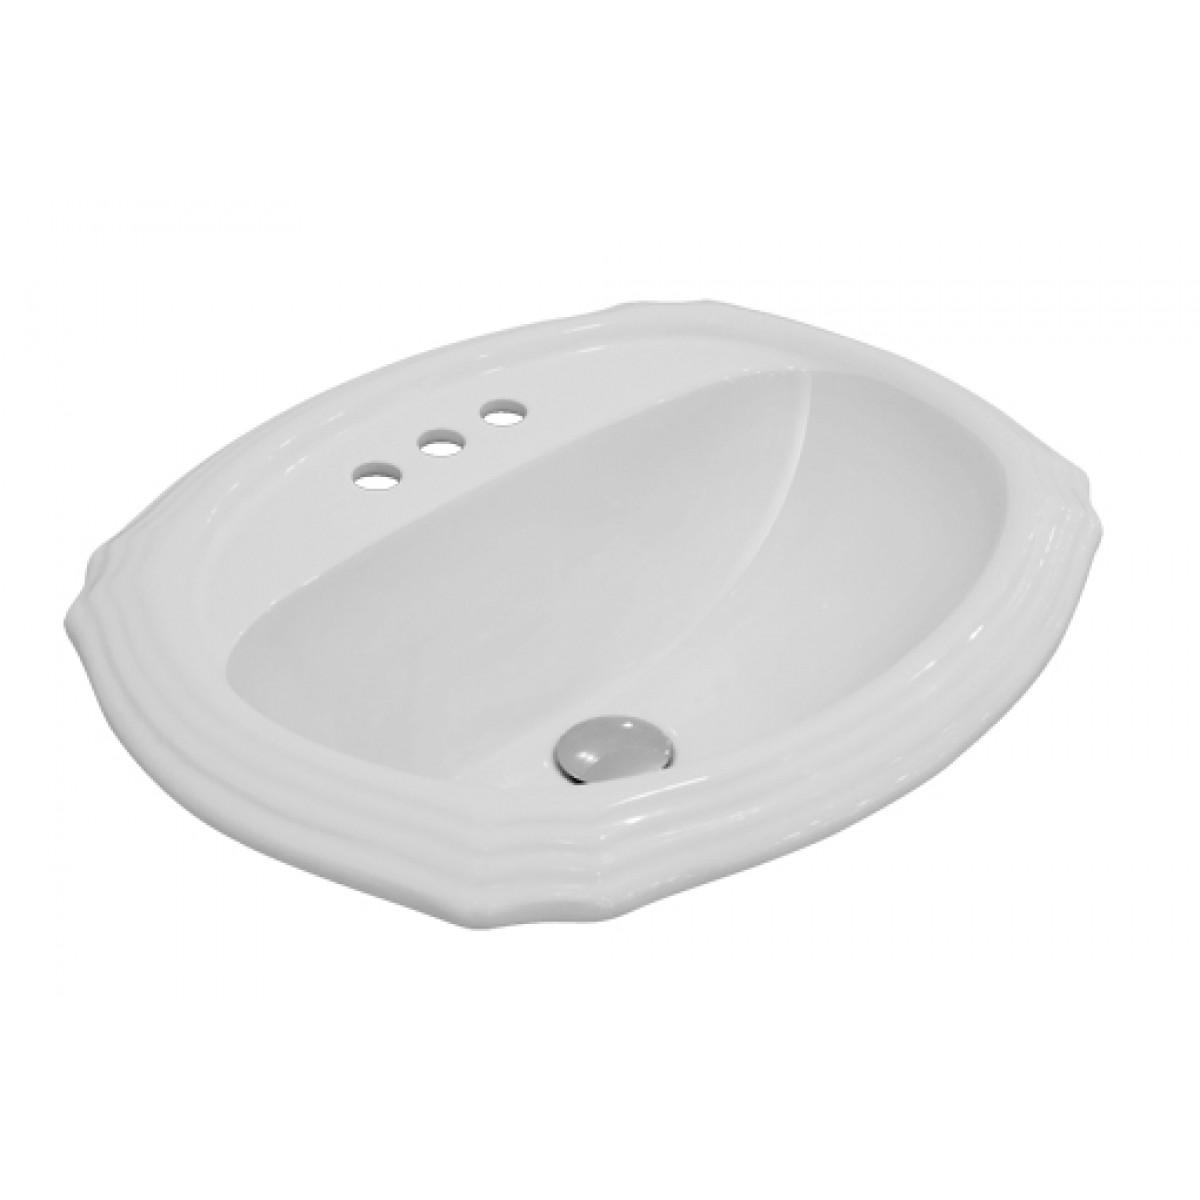 Drop In Vessel Sink : ... Vanity Drop In Bathroom Vessel Sink - 22-15/16 x 19-3/8 x 6-3/4 Inch